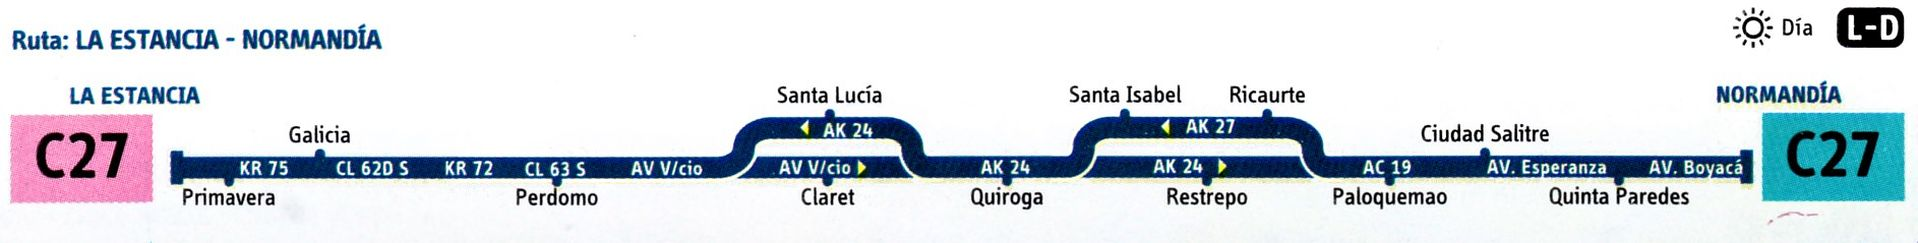 Ruta SITP: C27 La Estancia ↔ Normandía [Urbana] 3